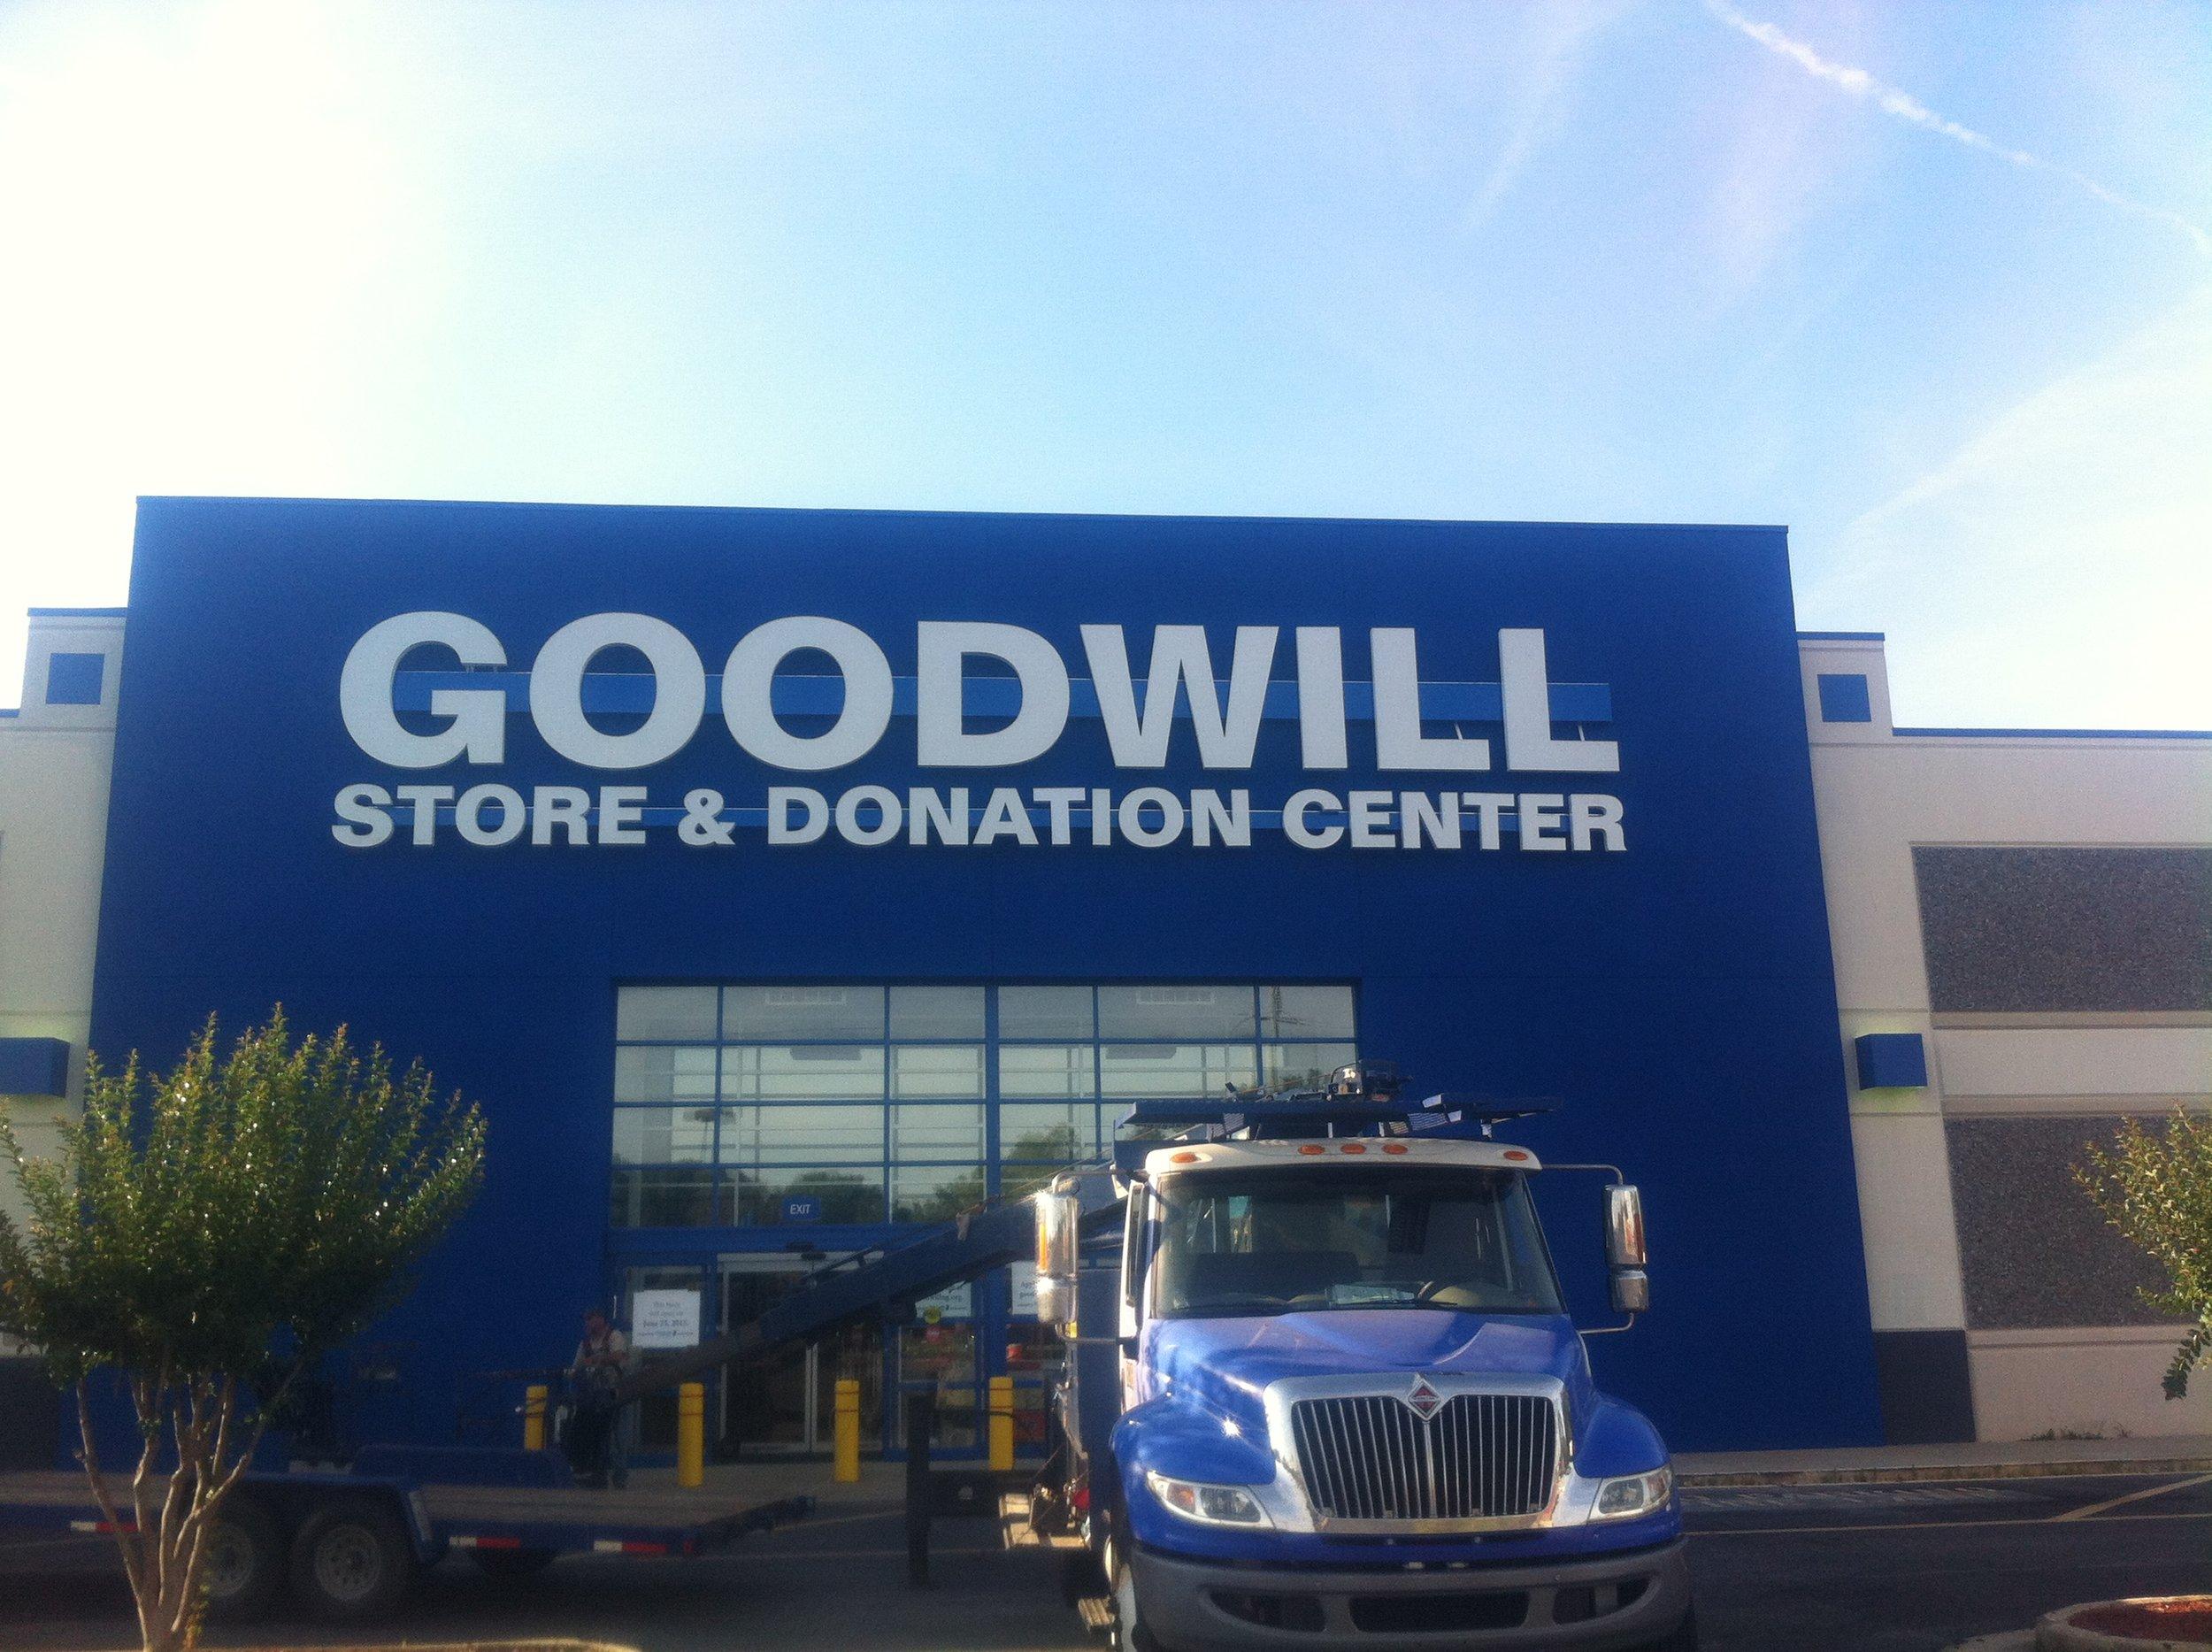 Goodwill-Athens-GA.jpg